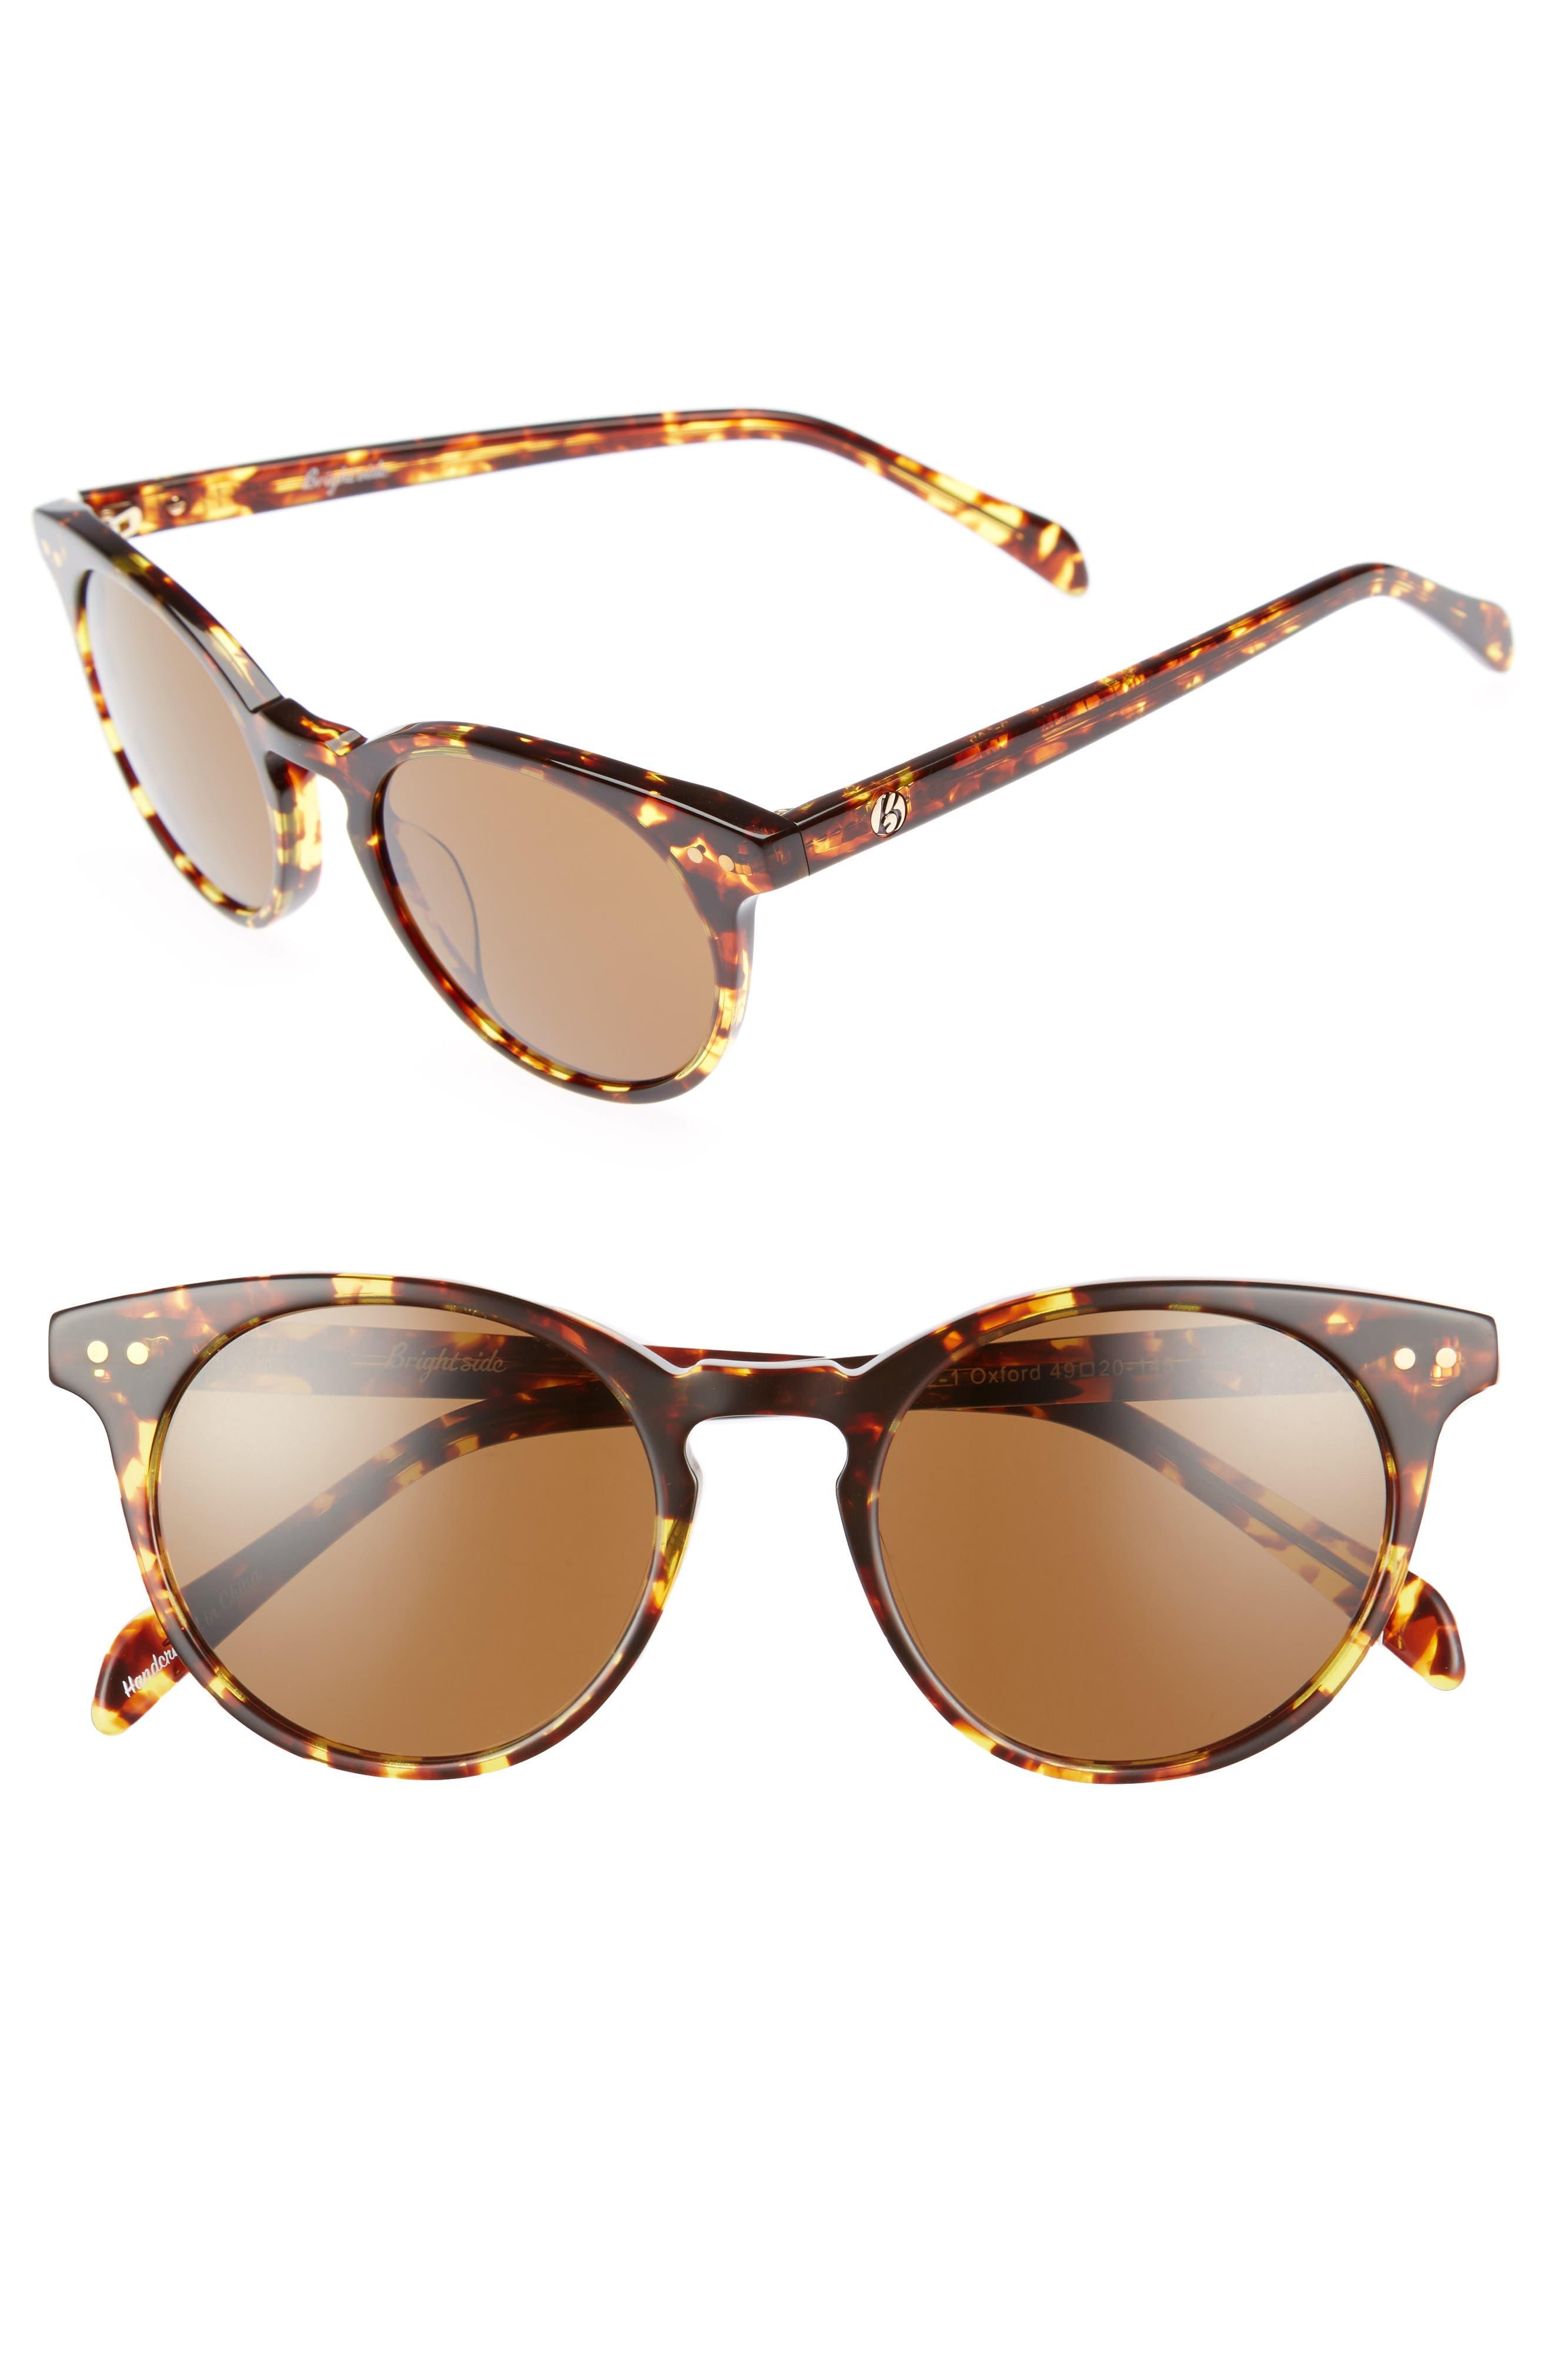 Brightside Oxford 49mm Sunglasses